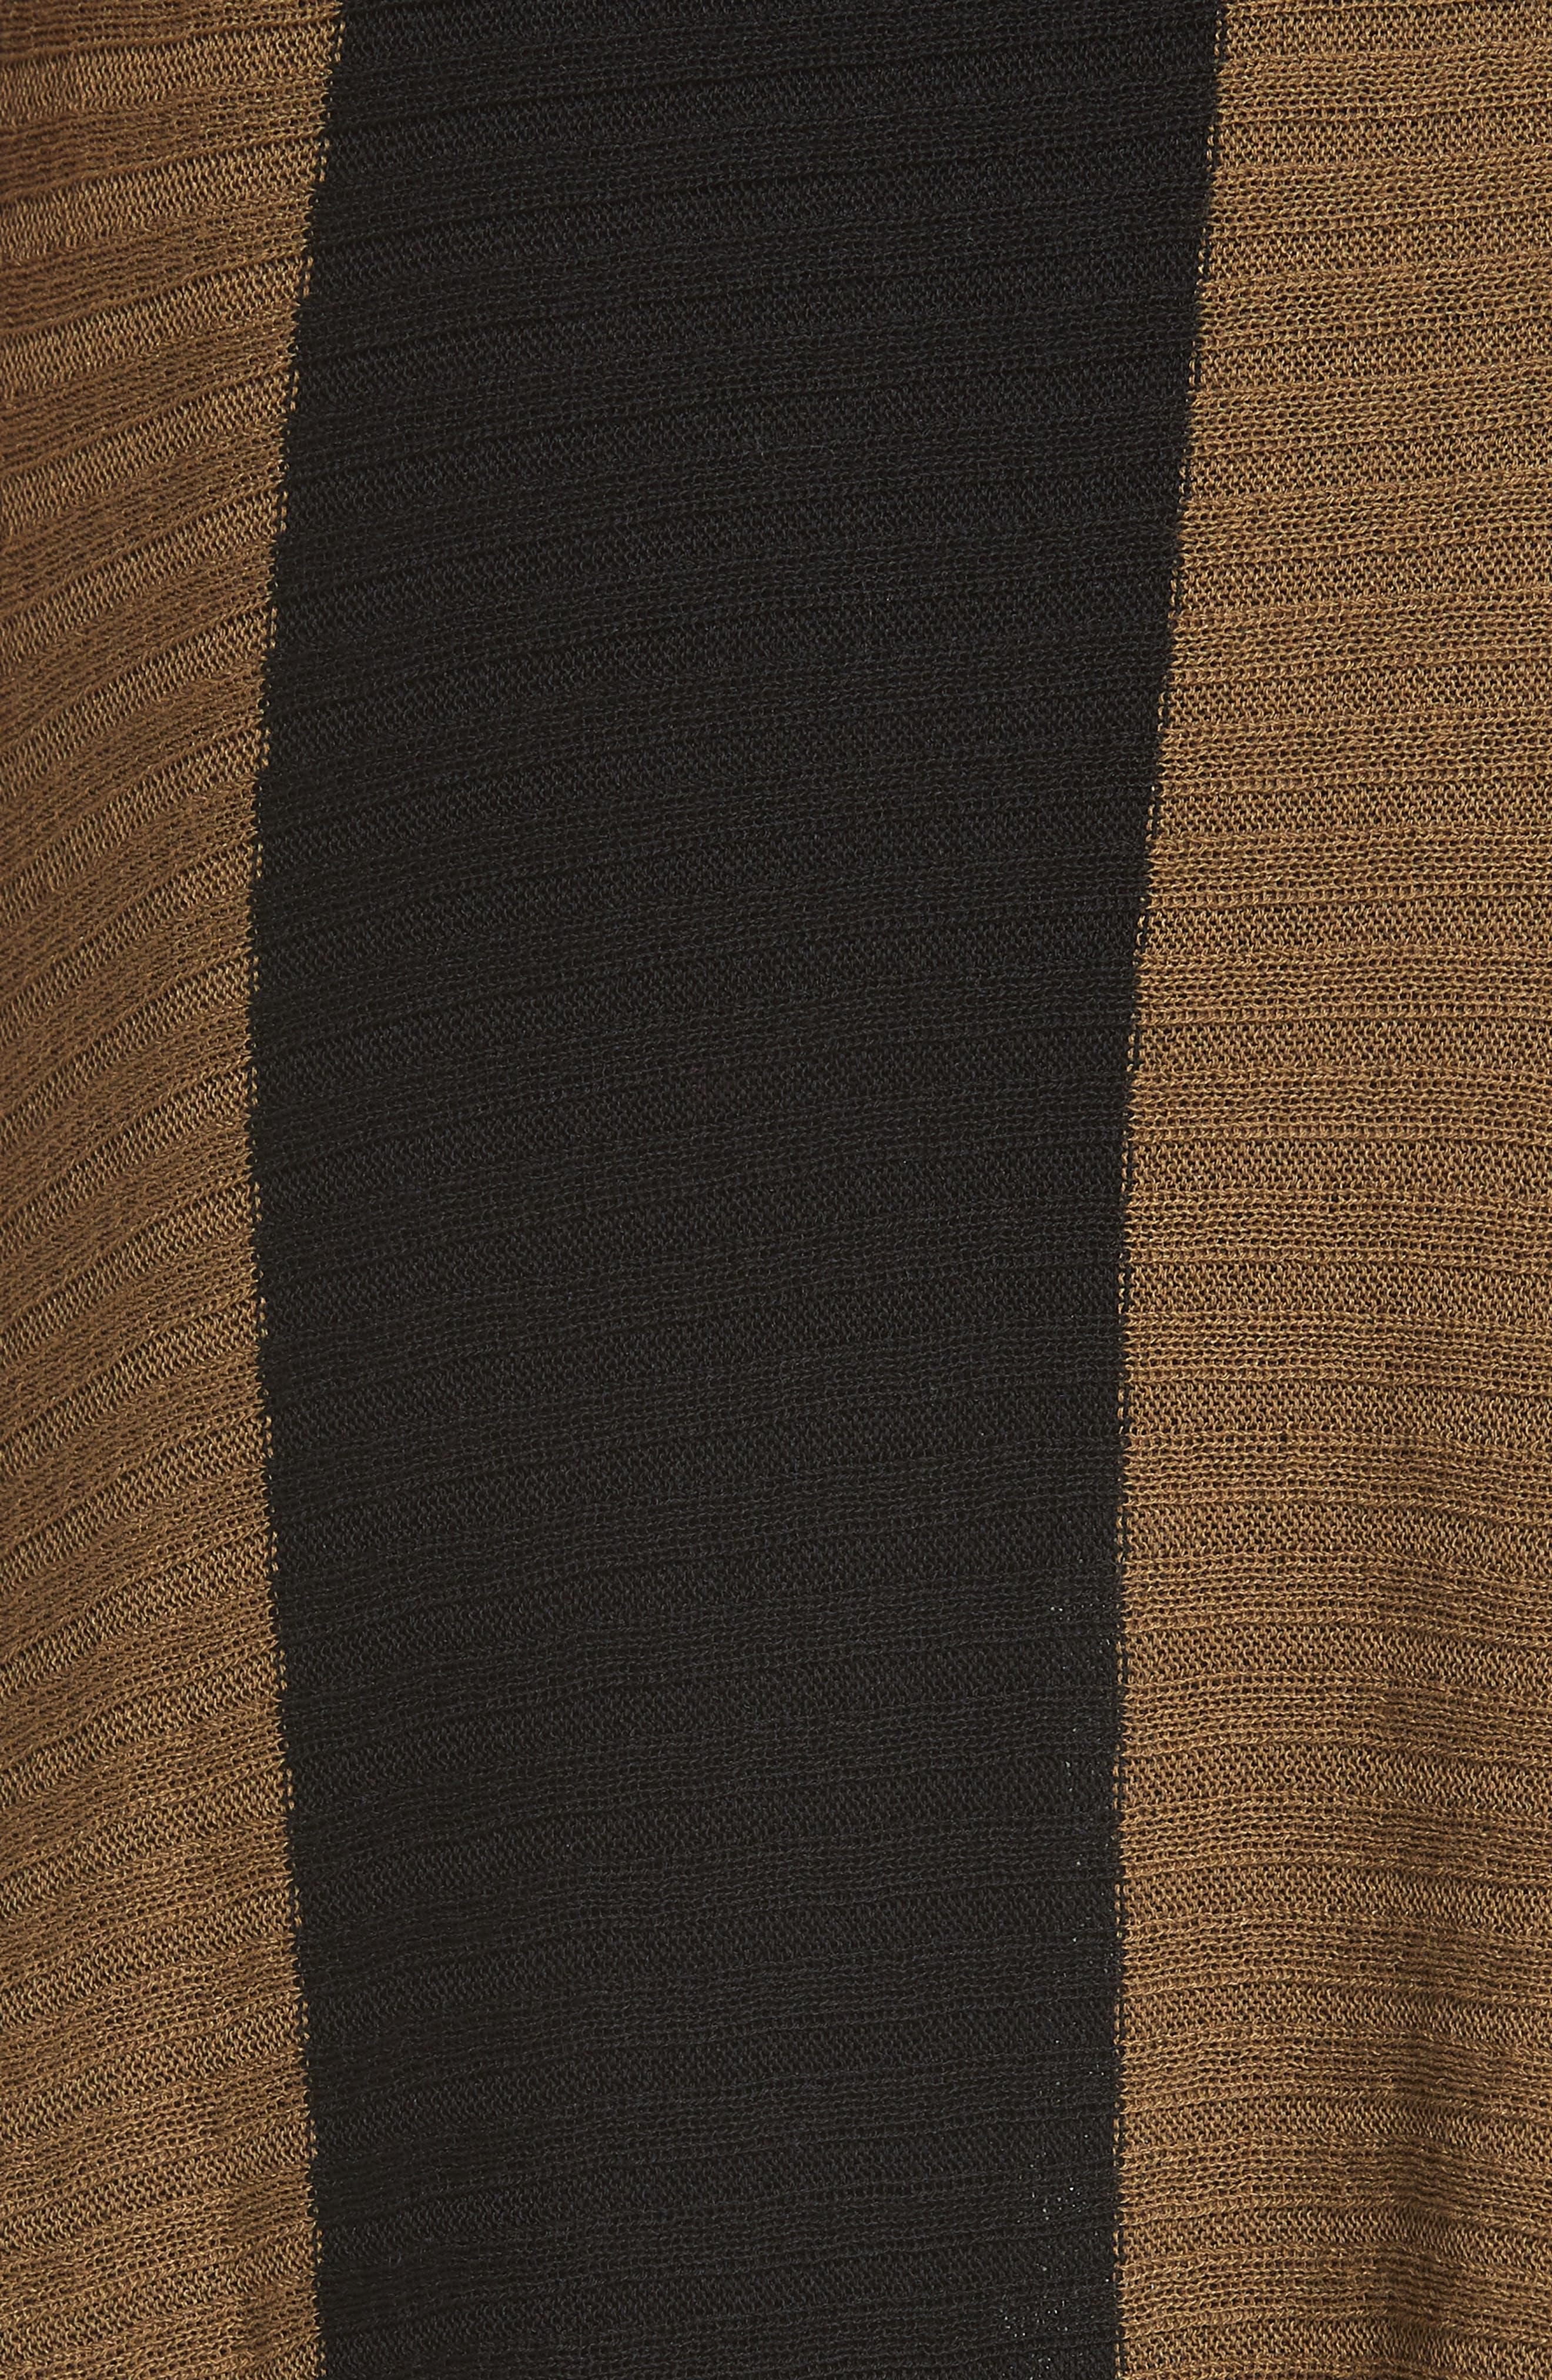 Marques'Almeida Draped Skirt,                             Alternate thumbnail 6, color,                             Khaki/ Black